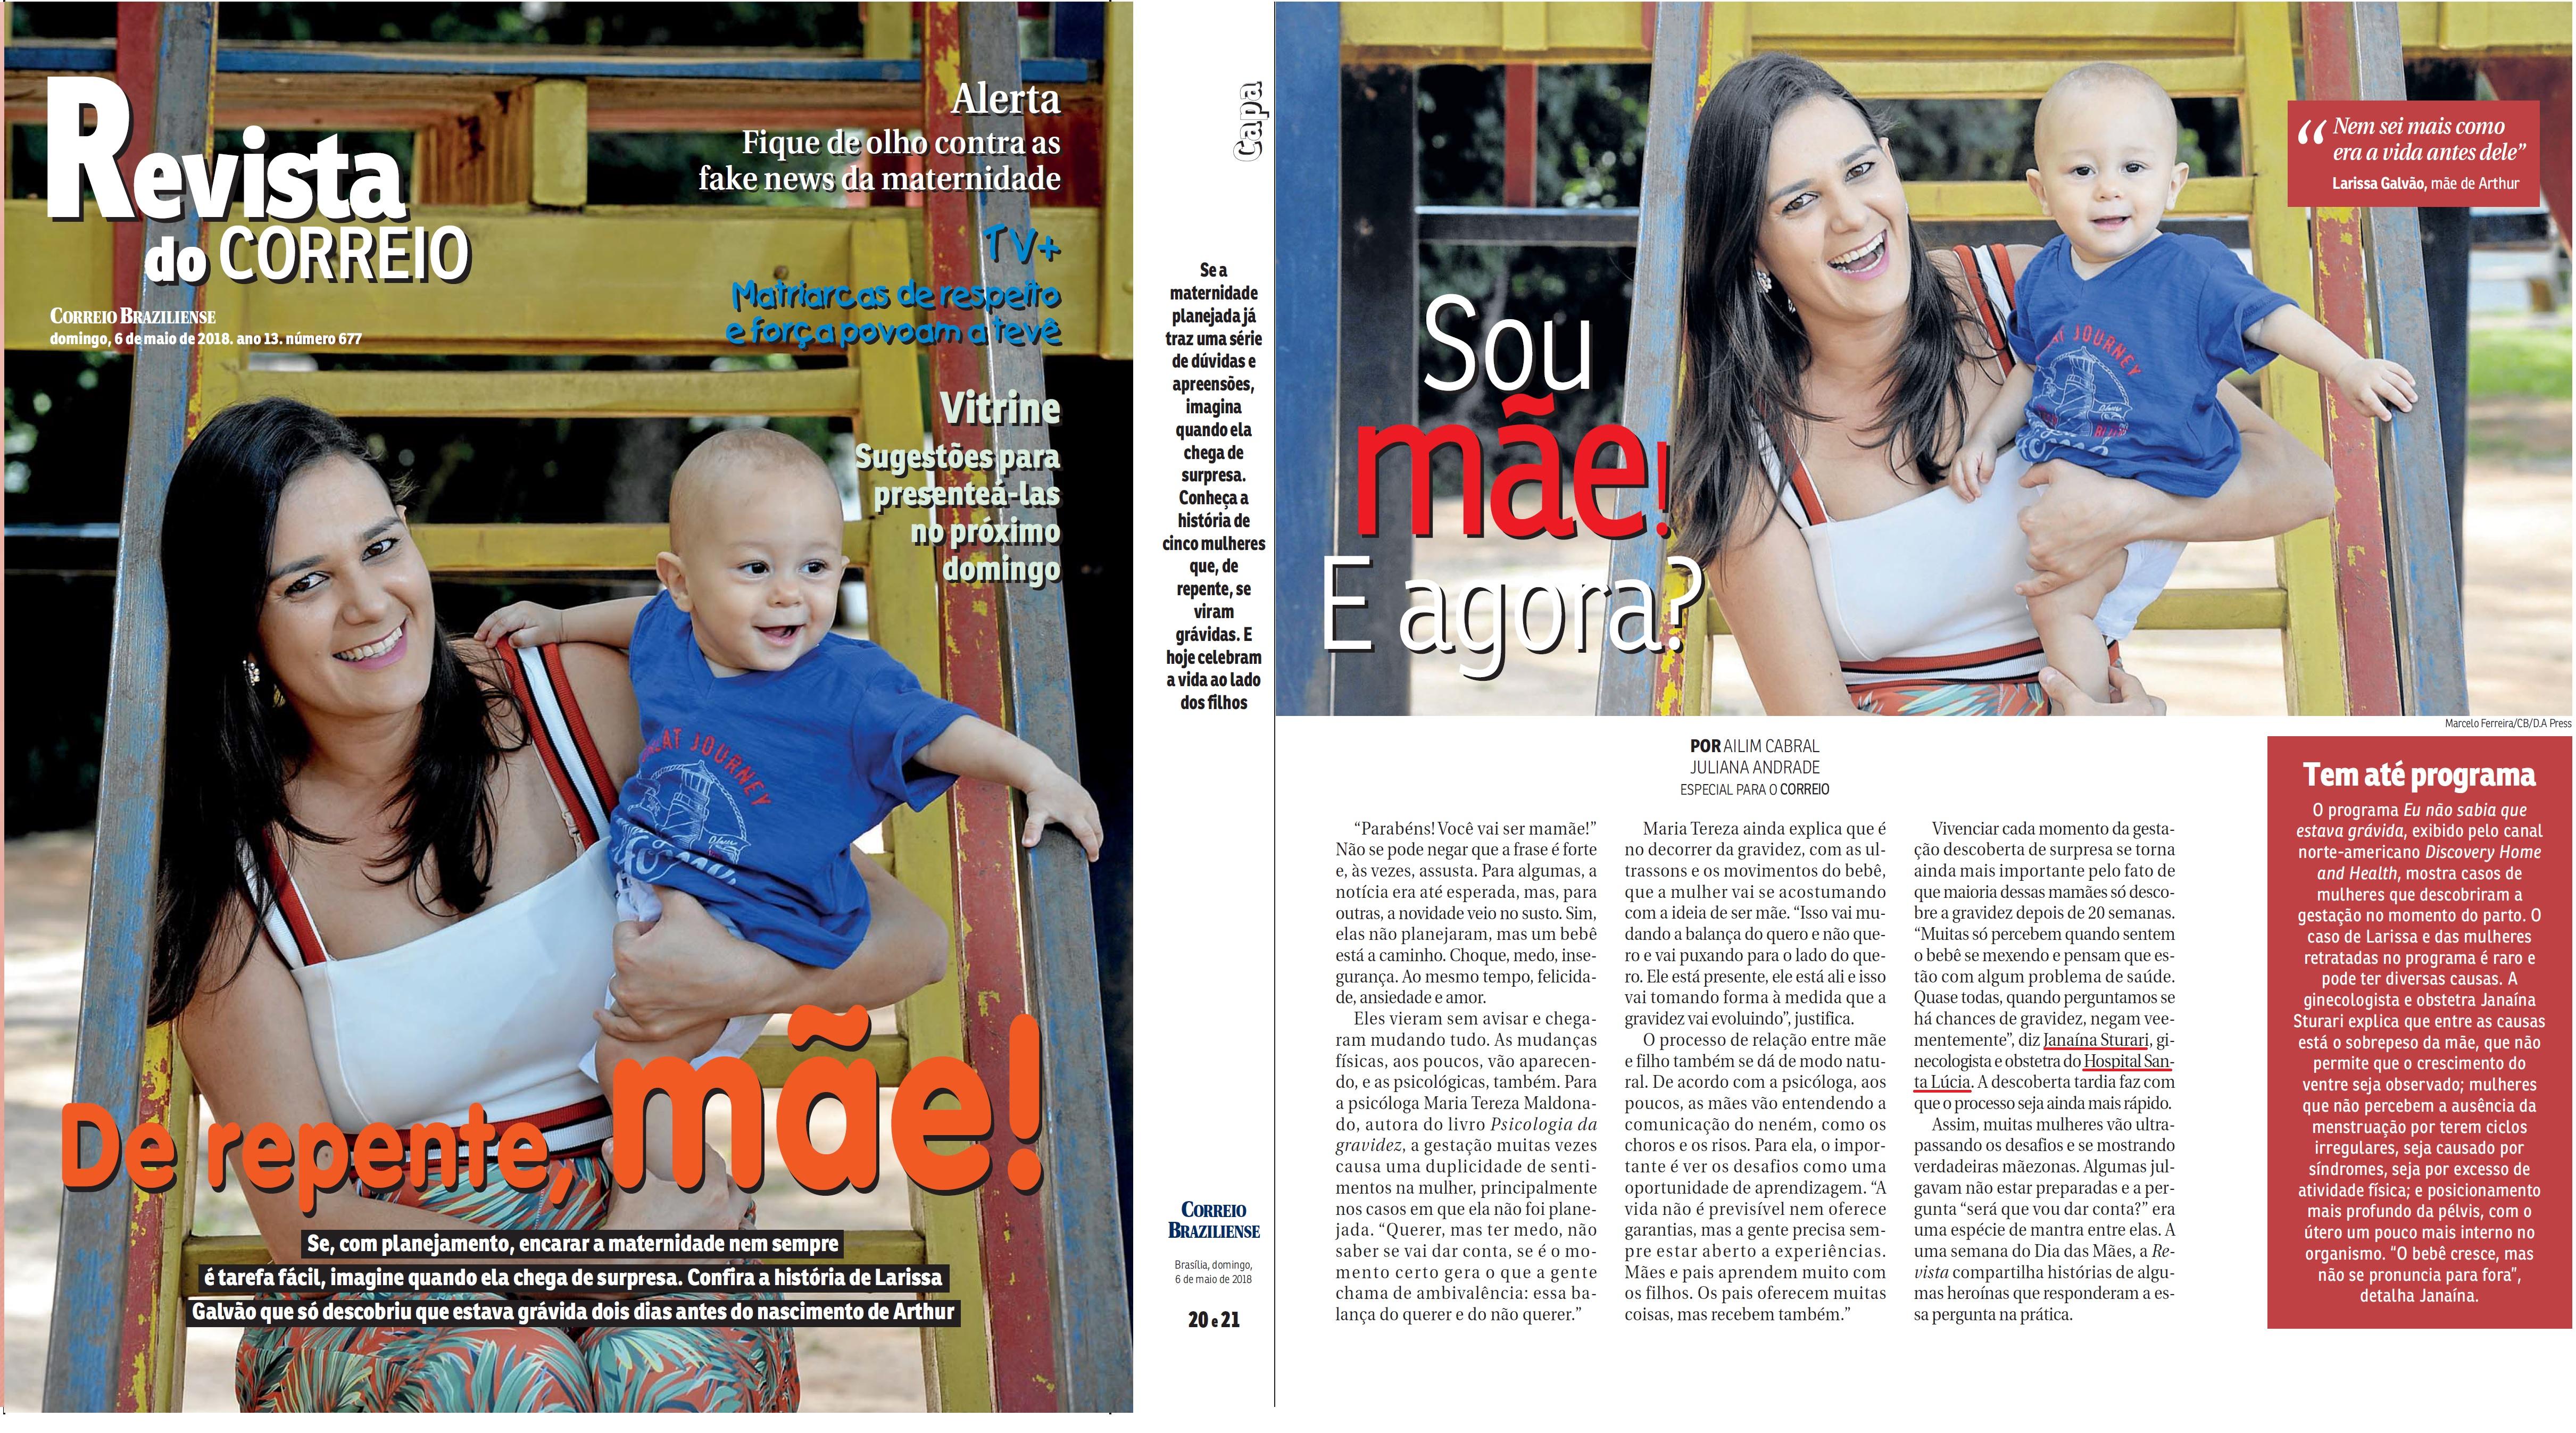 Revista do Correio - Dra. Janaína Sturari HSLS - 06-05-2018